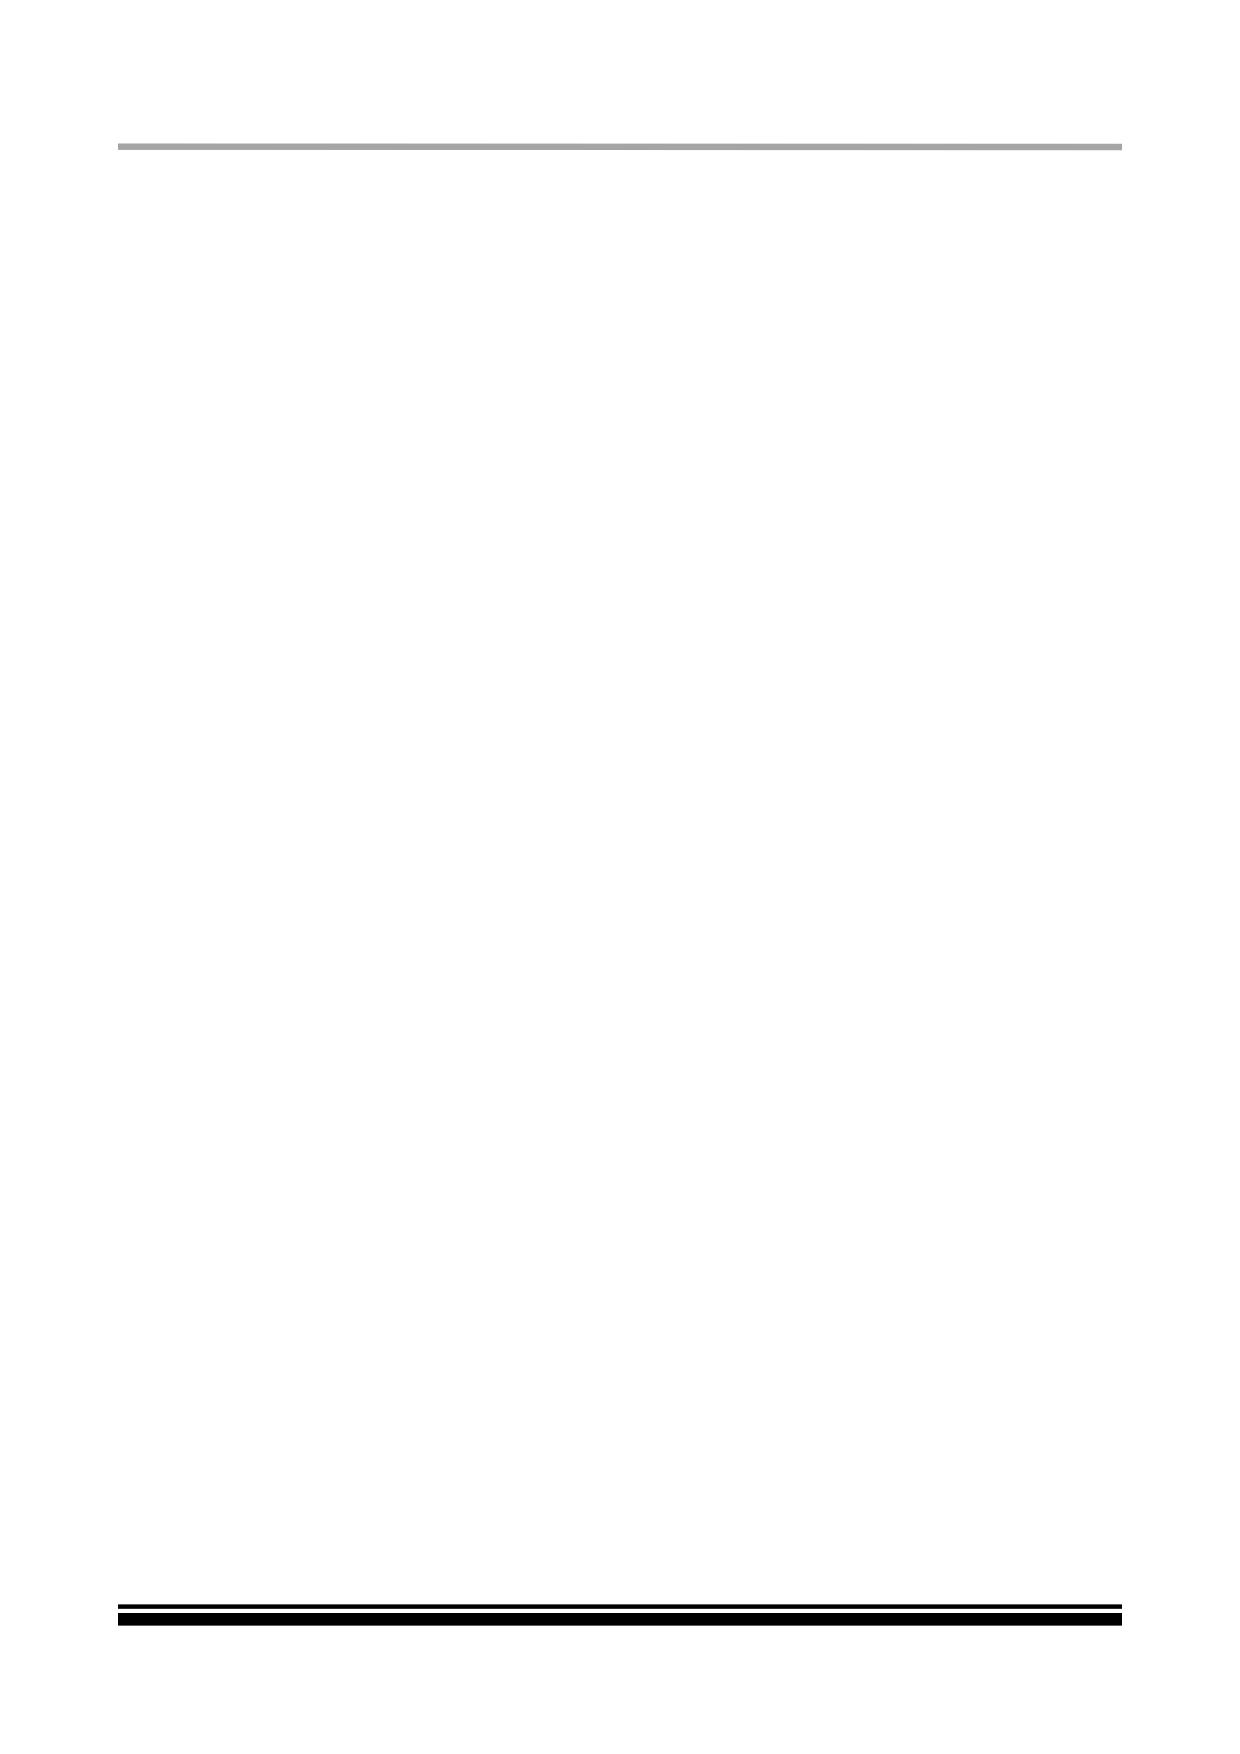 I2420-6OMN4823A Даташит, Описание, Даташиты